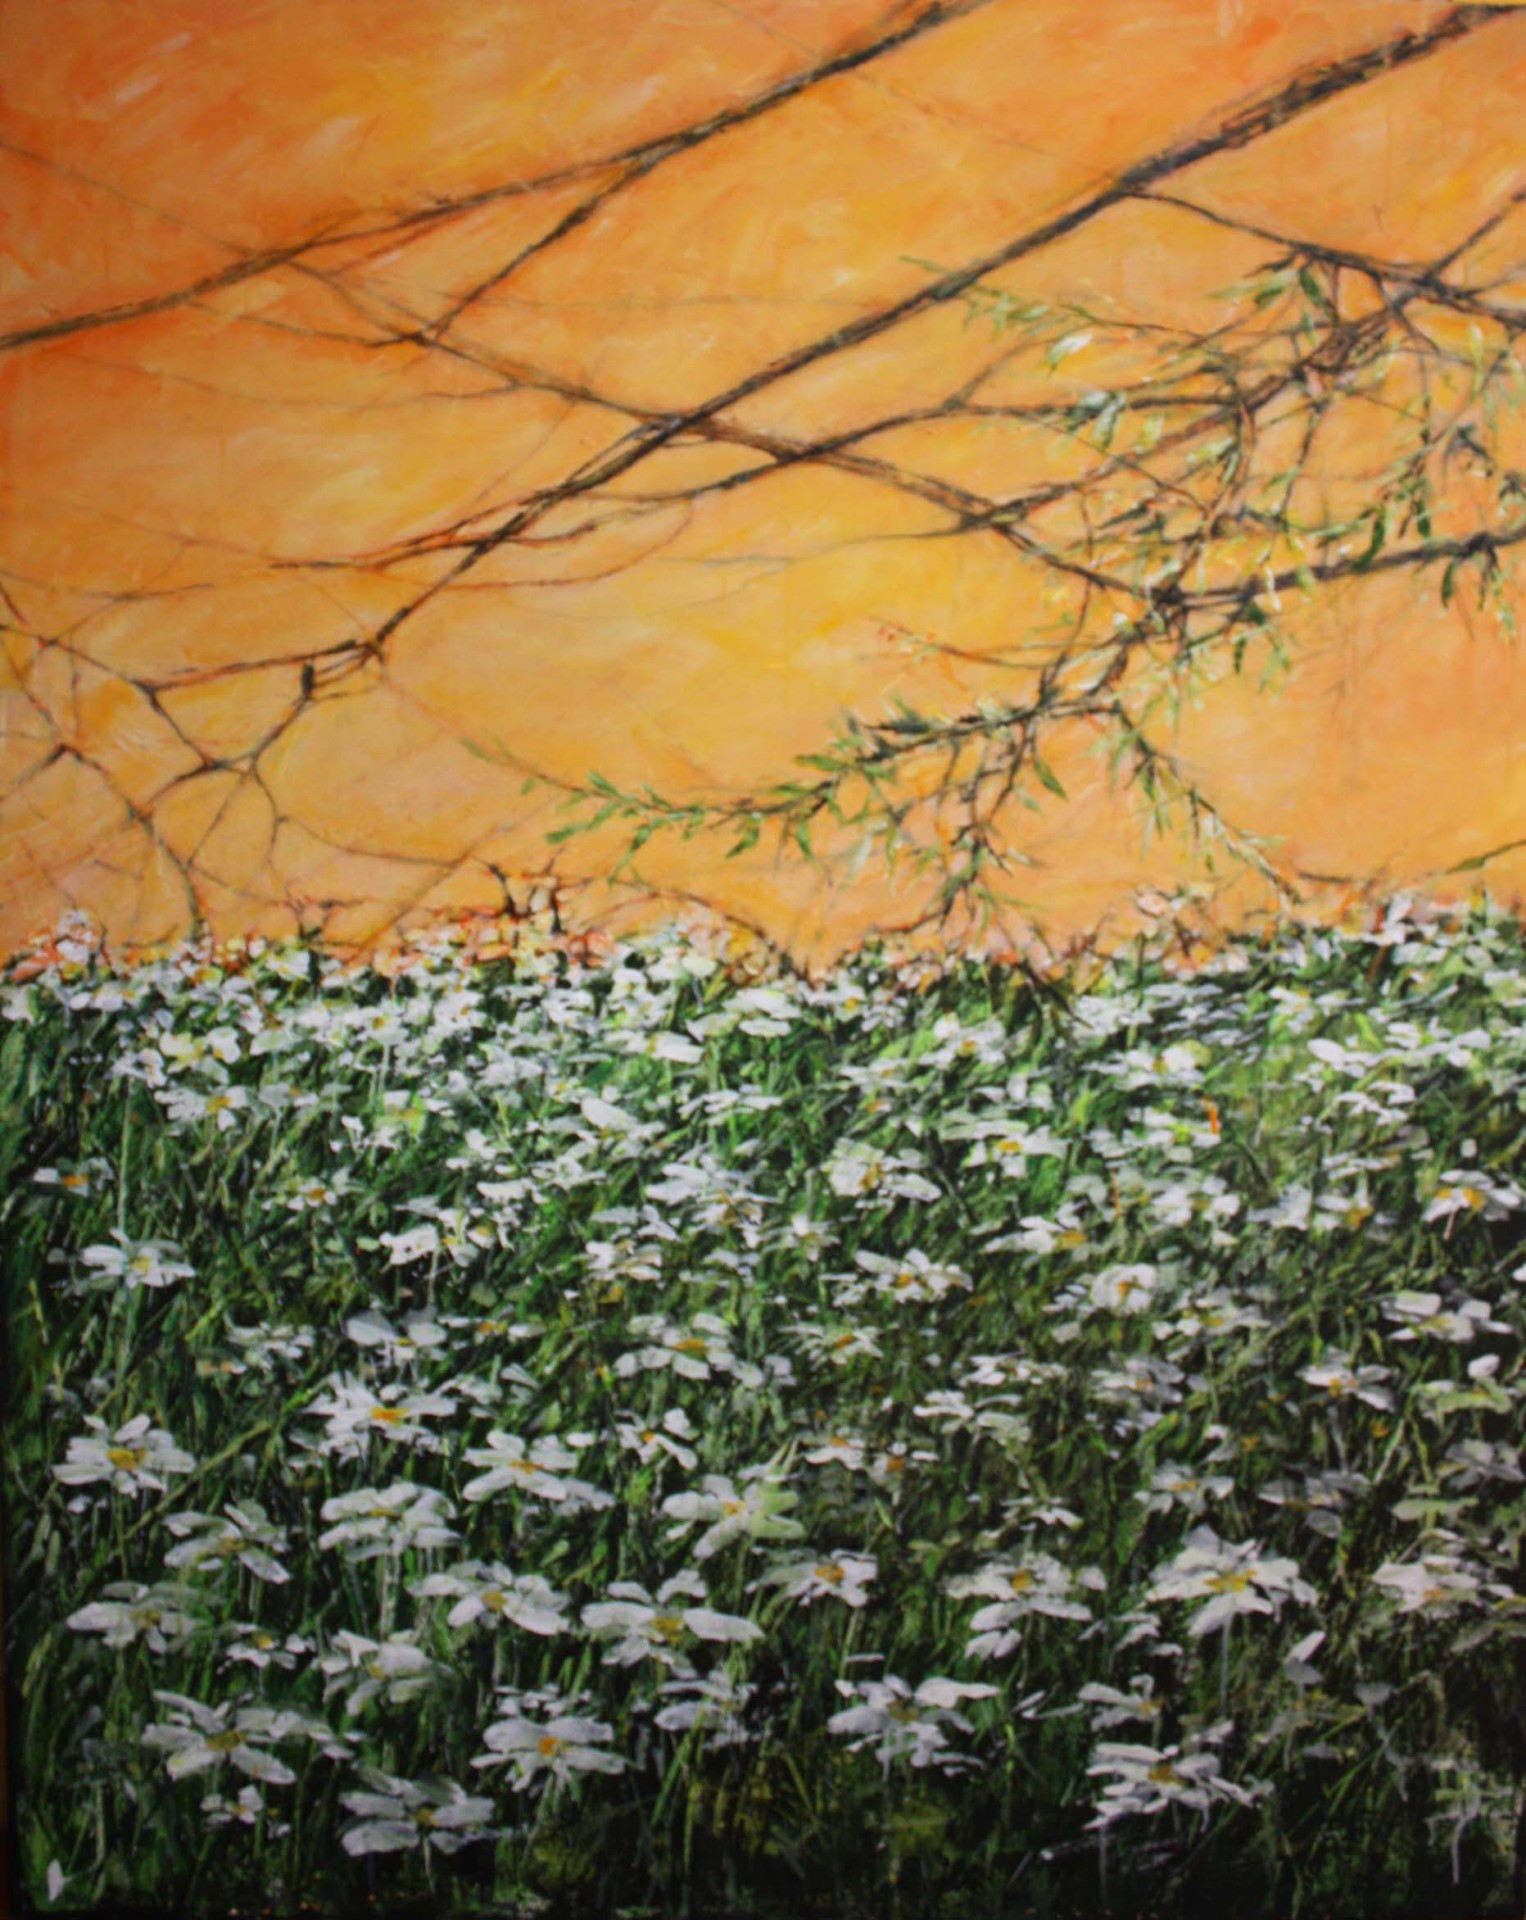 Daisies under orange sky( one of 2 panels)